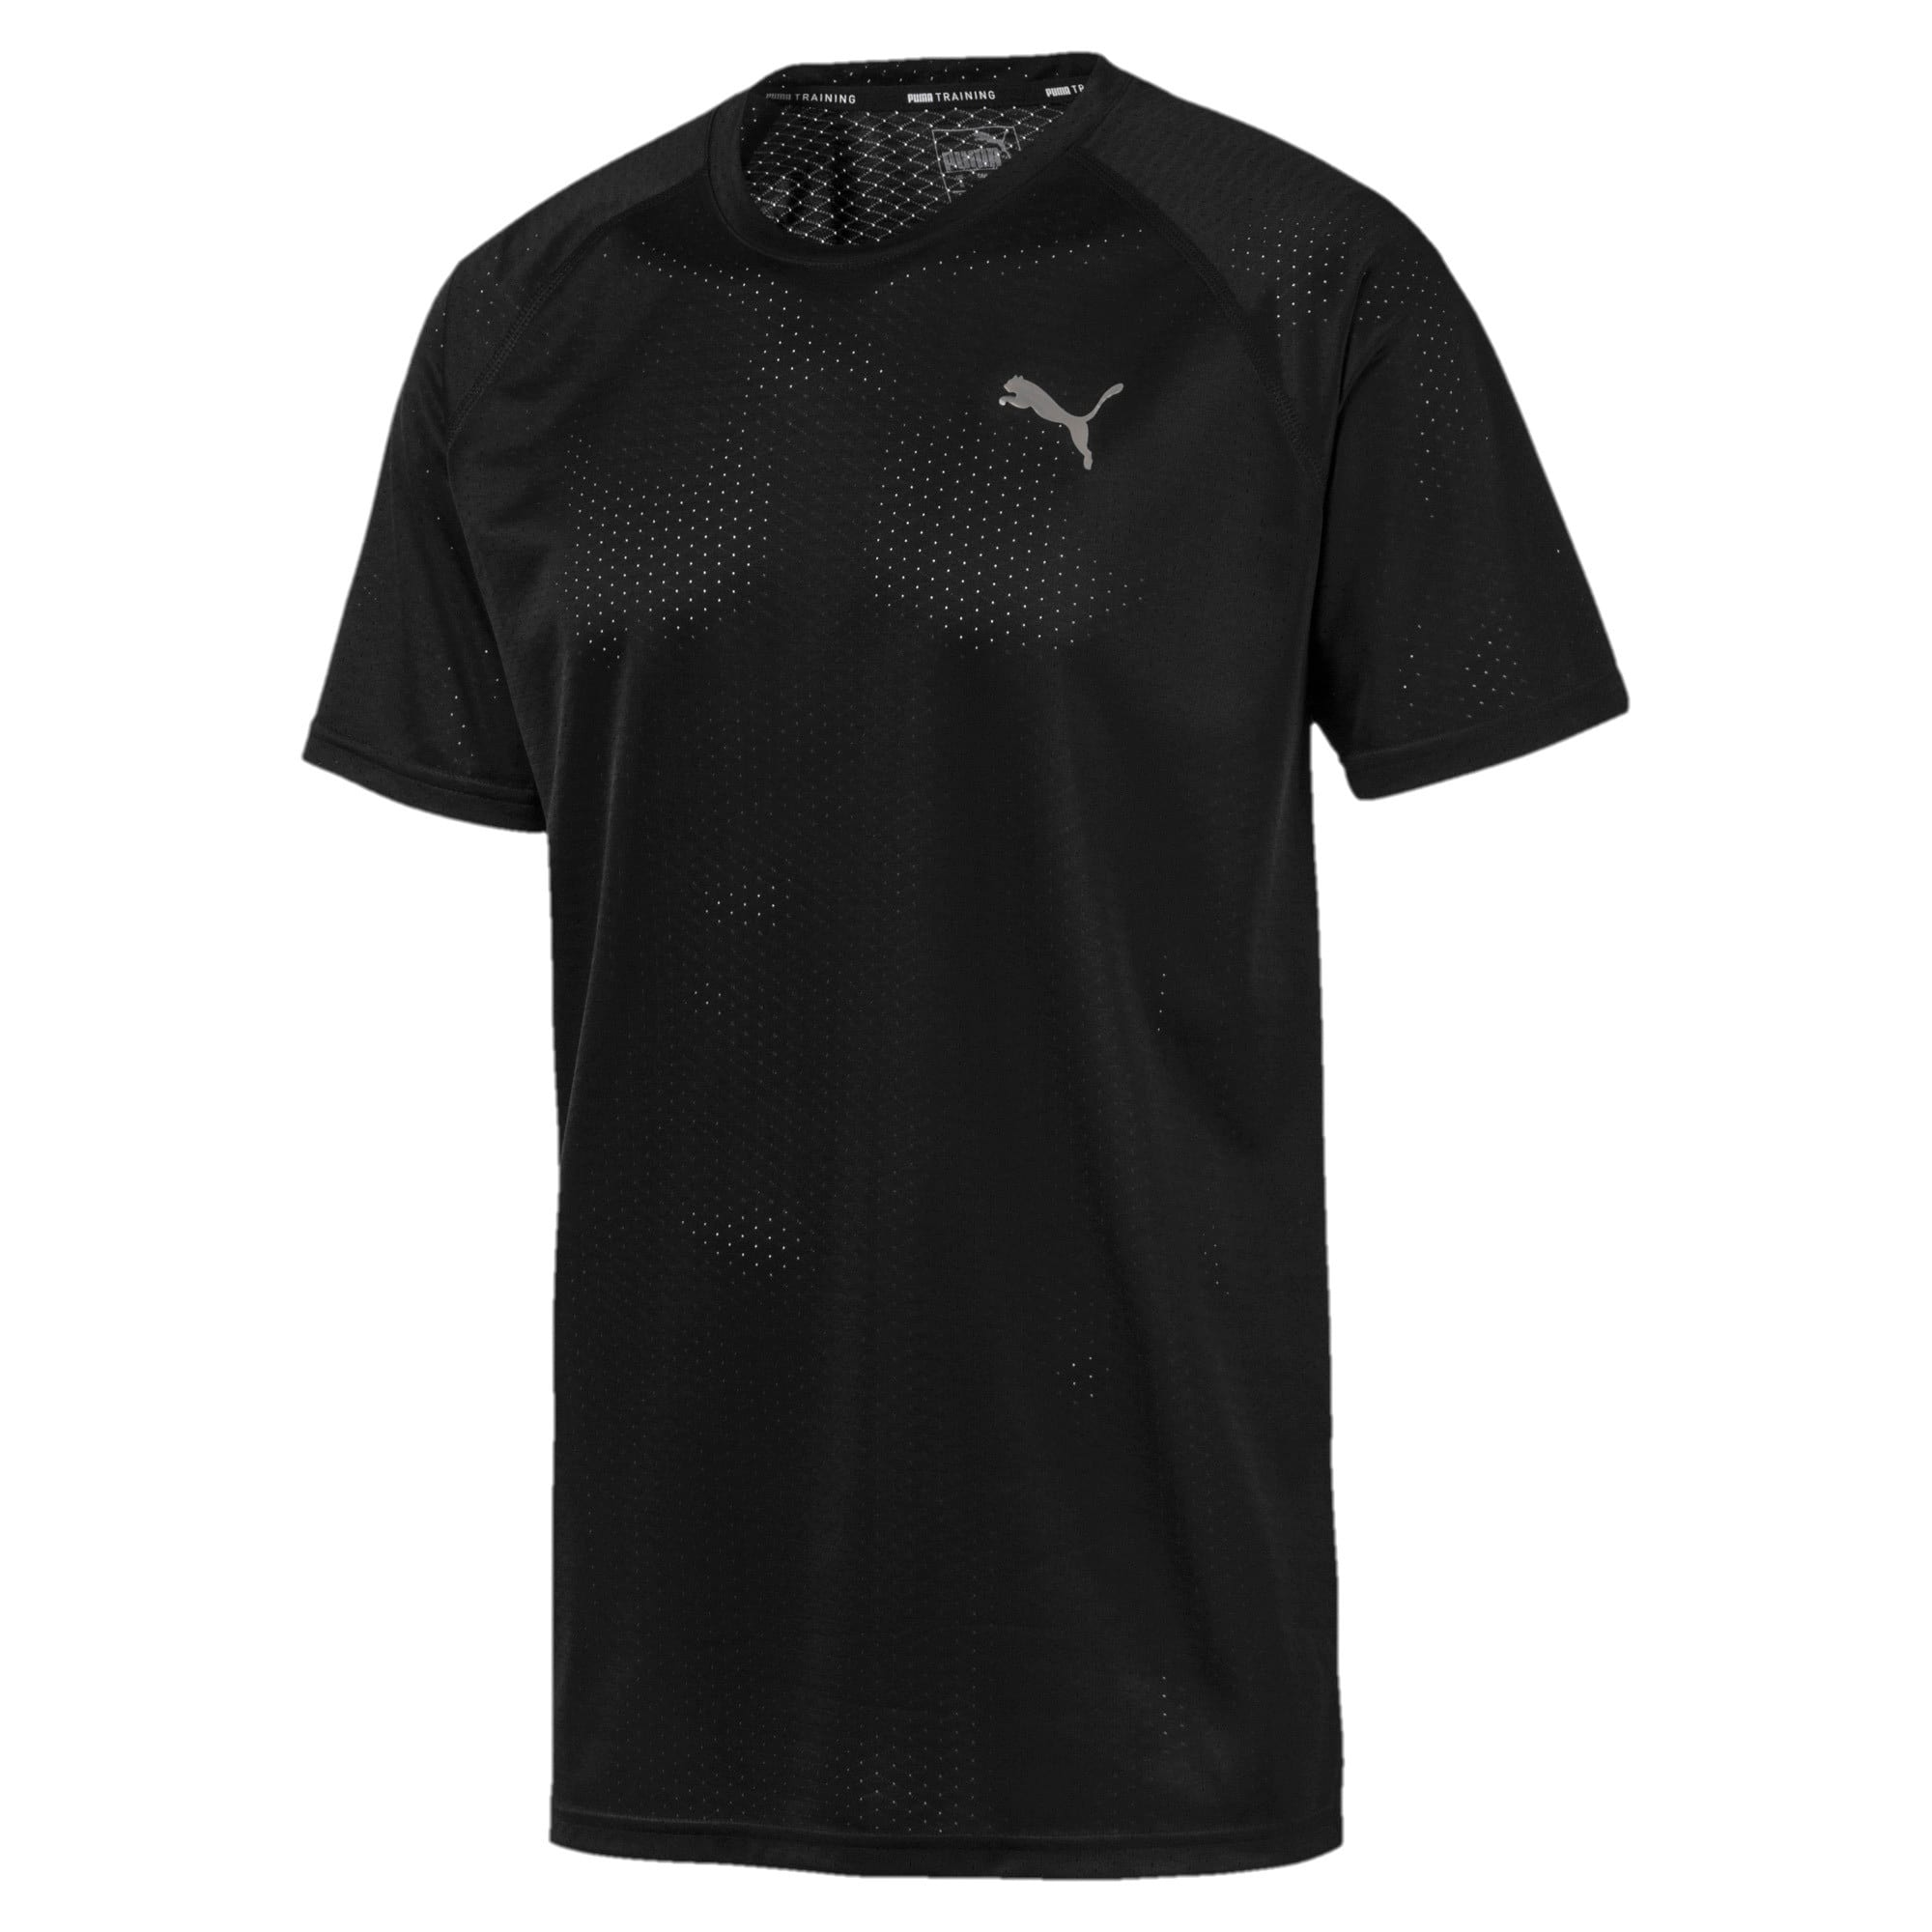 Thumbnail 4 of Tech Herren Training T-Shirt, Puma Black, medium